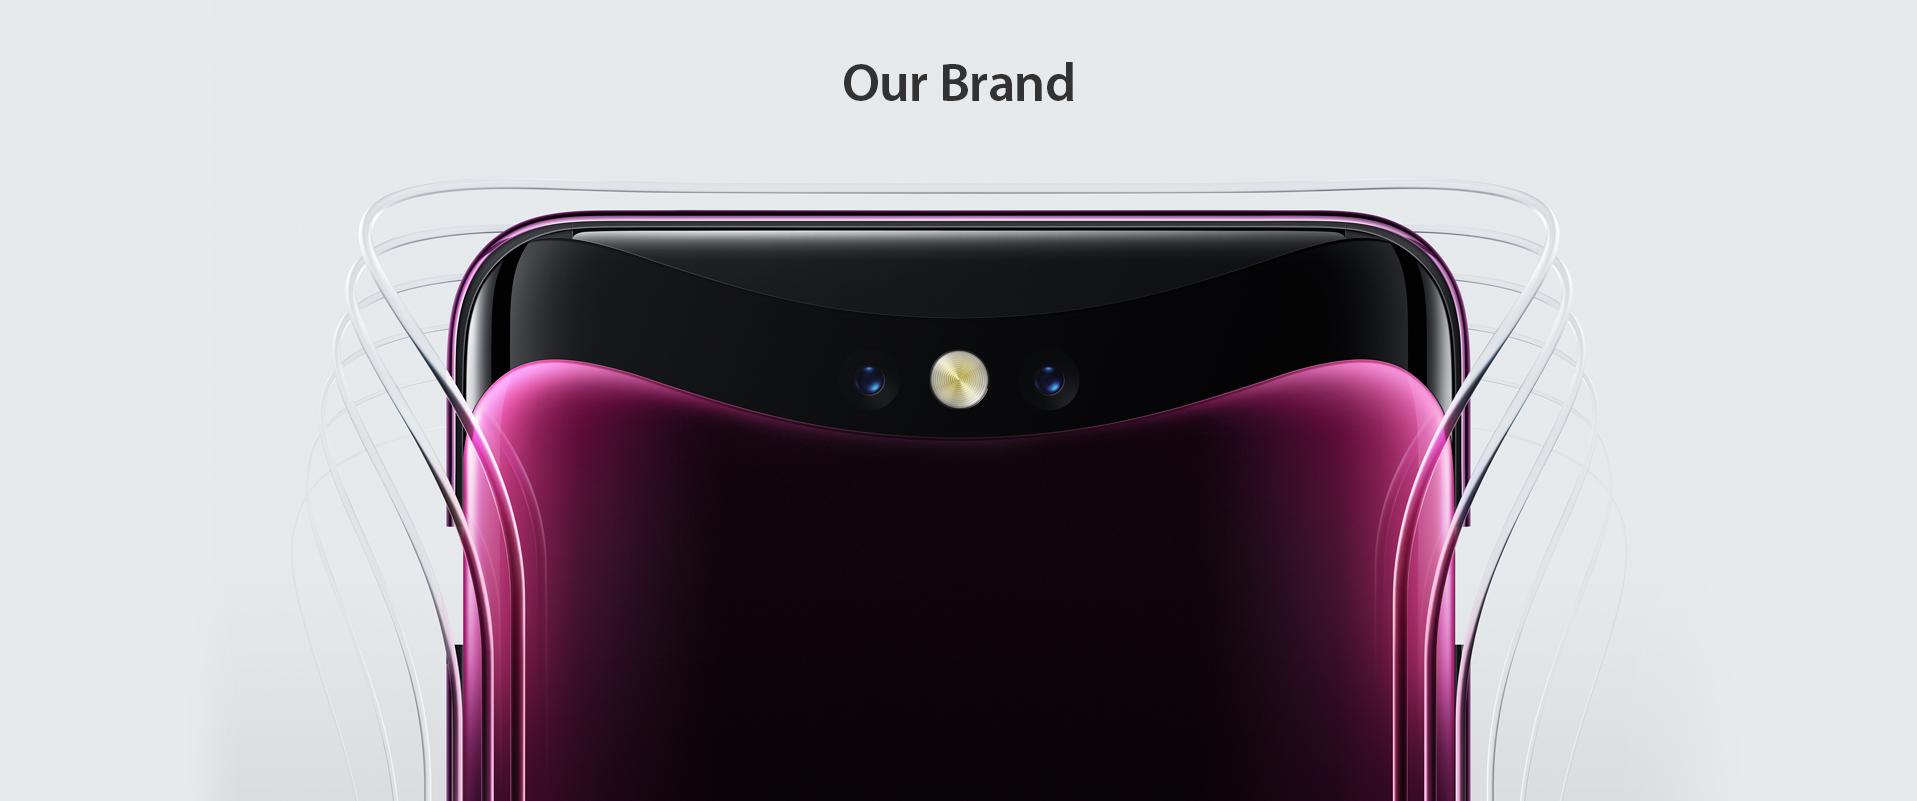 OPPO Mobile for Smartphones & Accessories | OPPO UAE